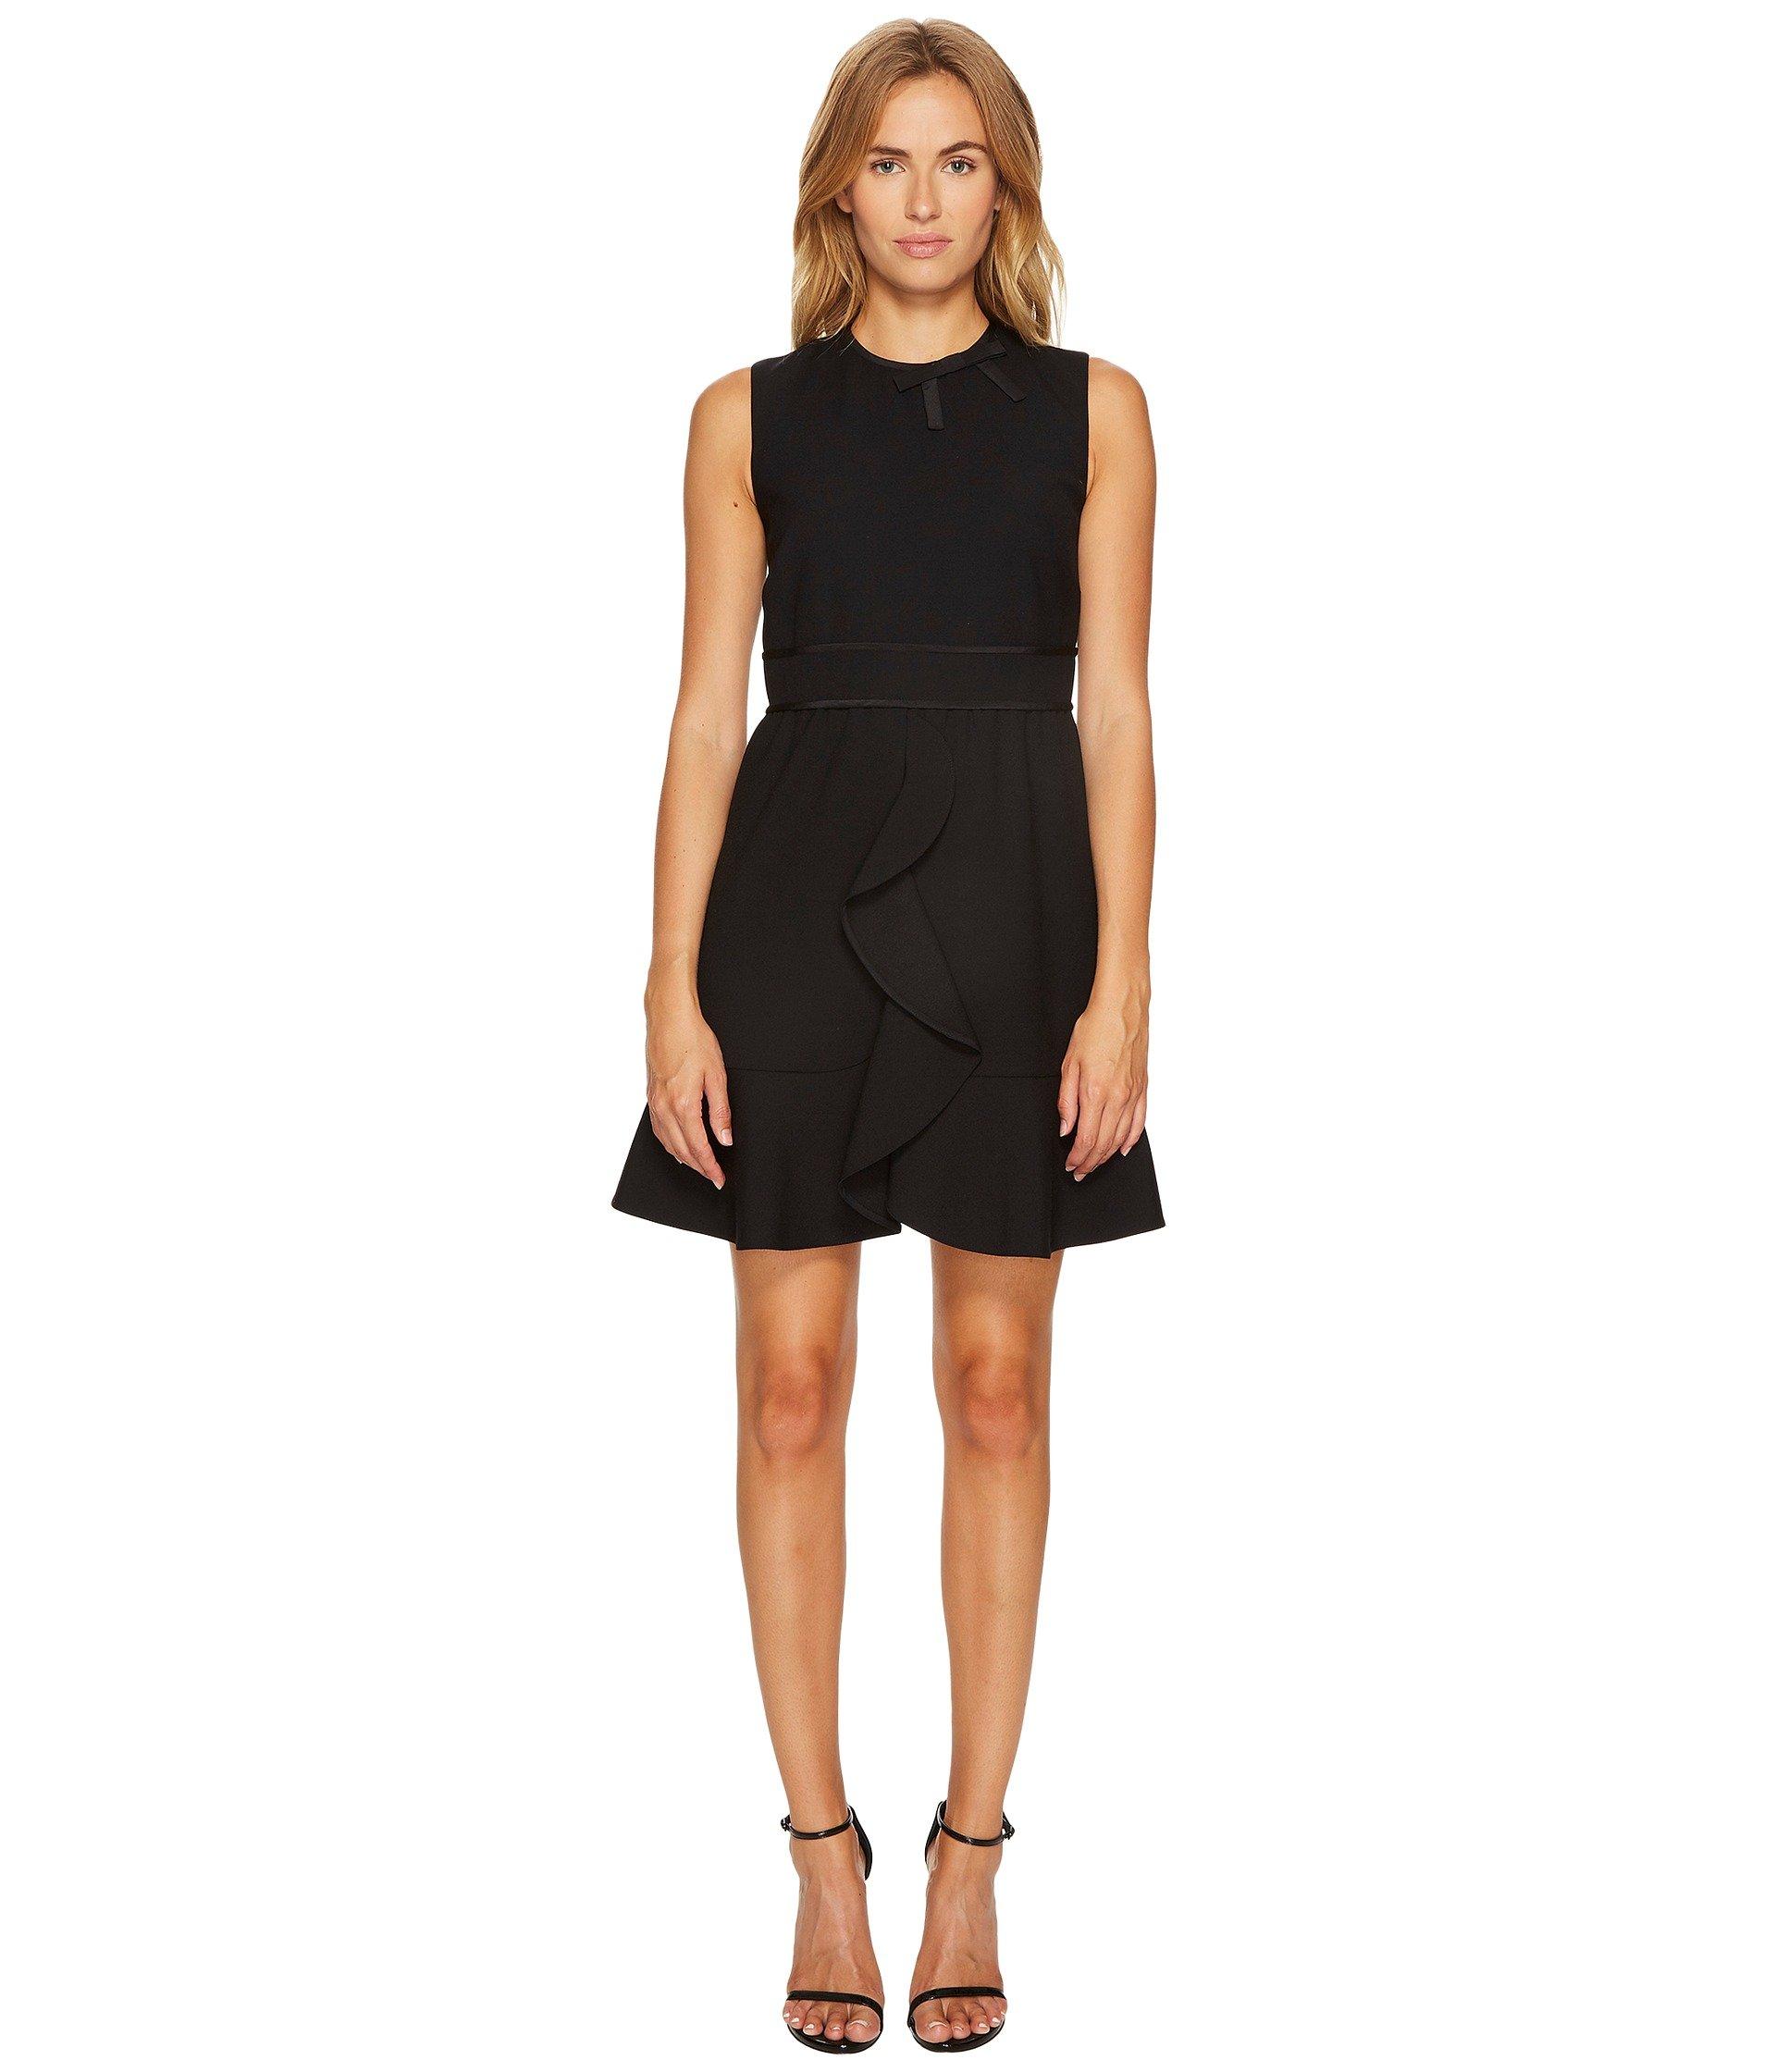 Cady Tech Dress